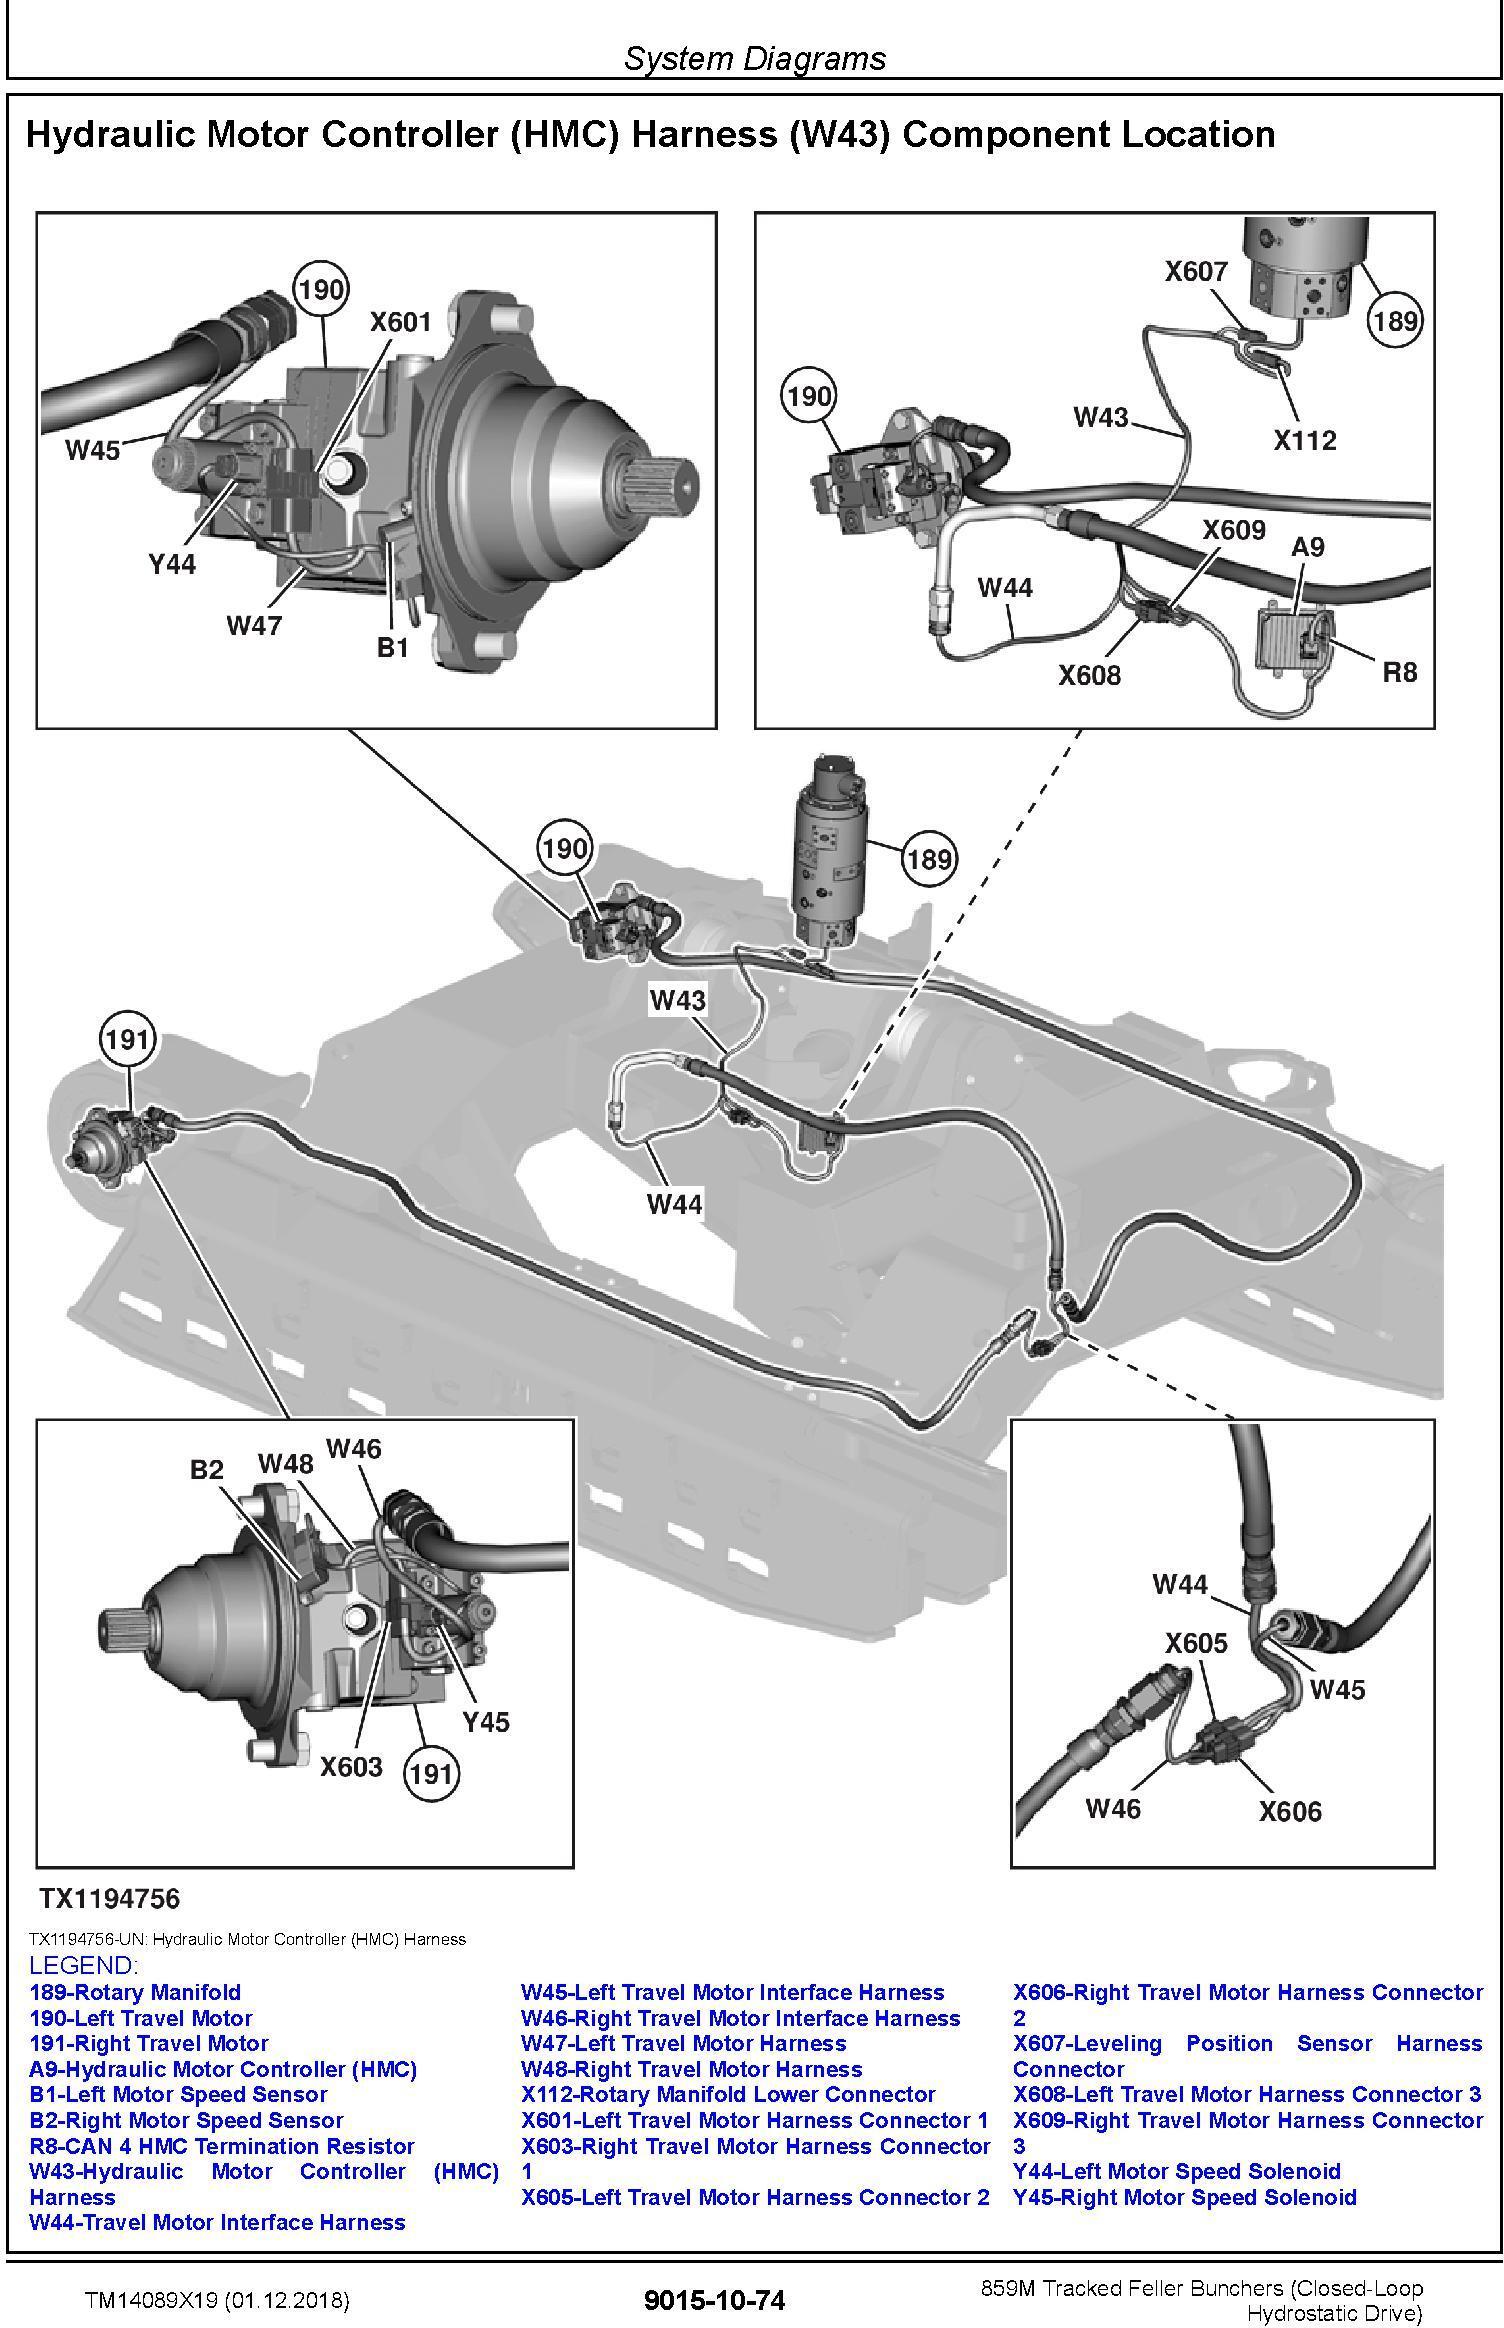 John Deere 859M (SN. F293917-,L343918-) Feller Bunchers (Closed-Loop) Diagnostic Manual (TM14089X19) - 2